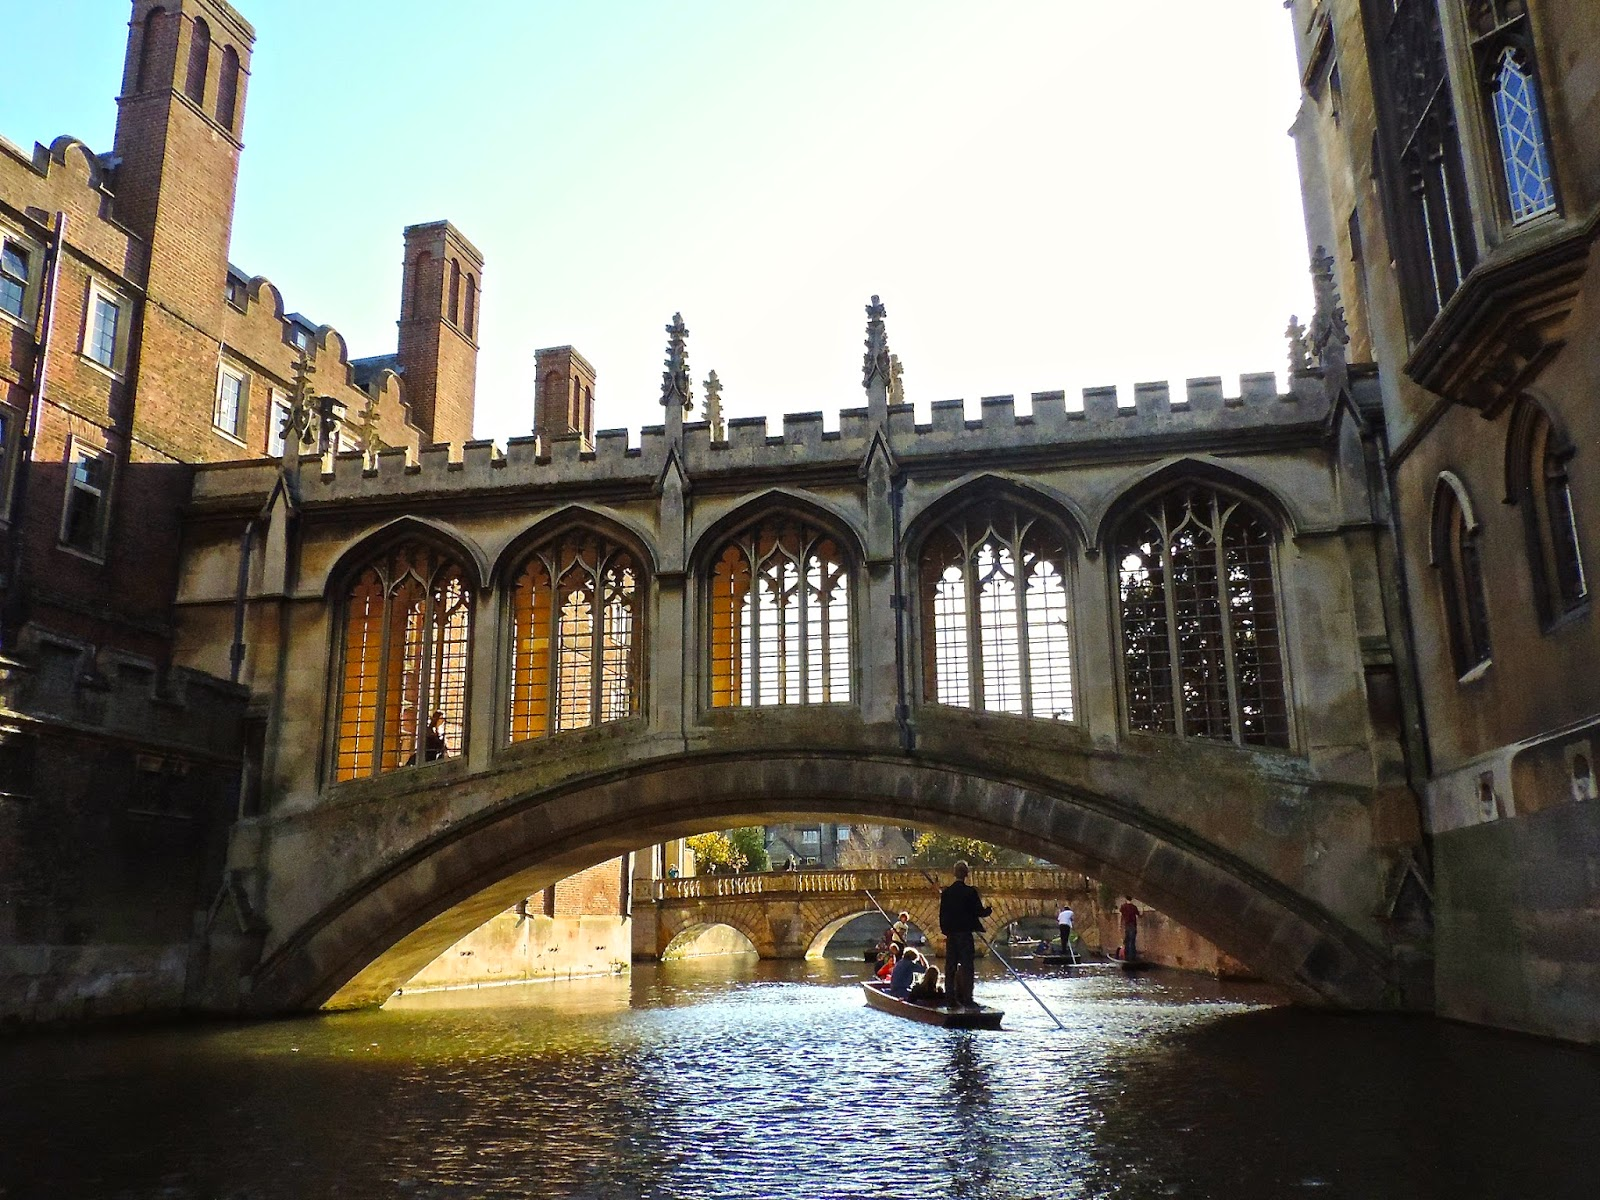 St John's College bridge of sighs